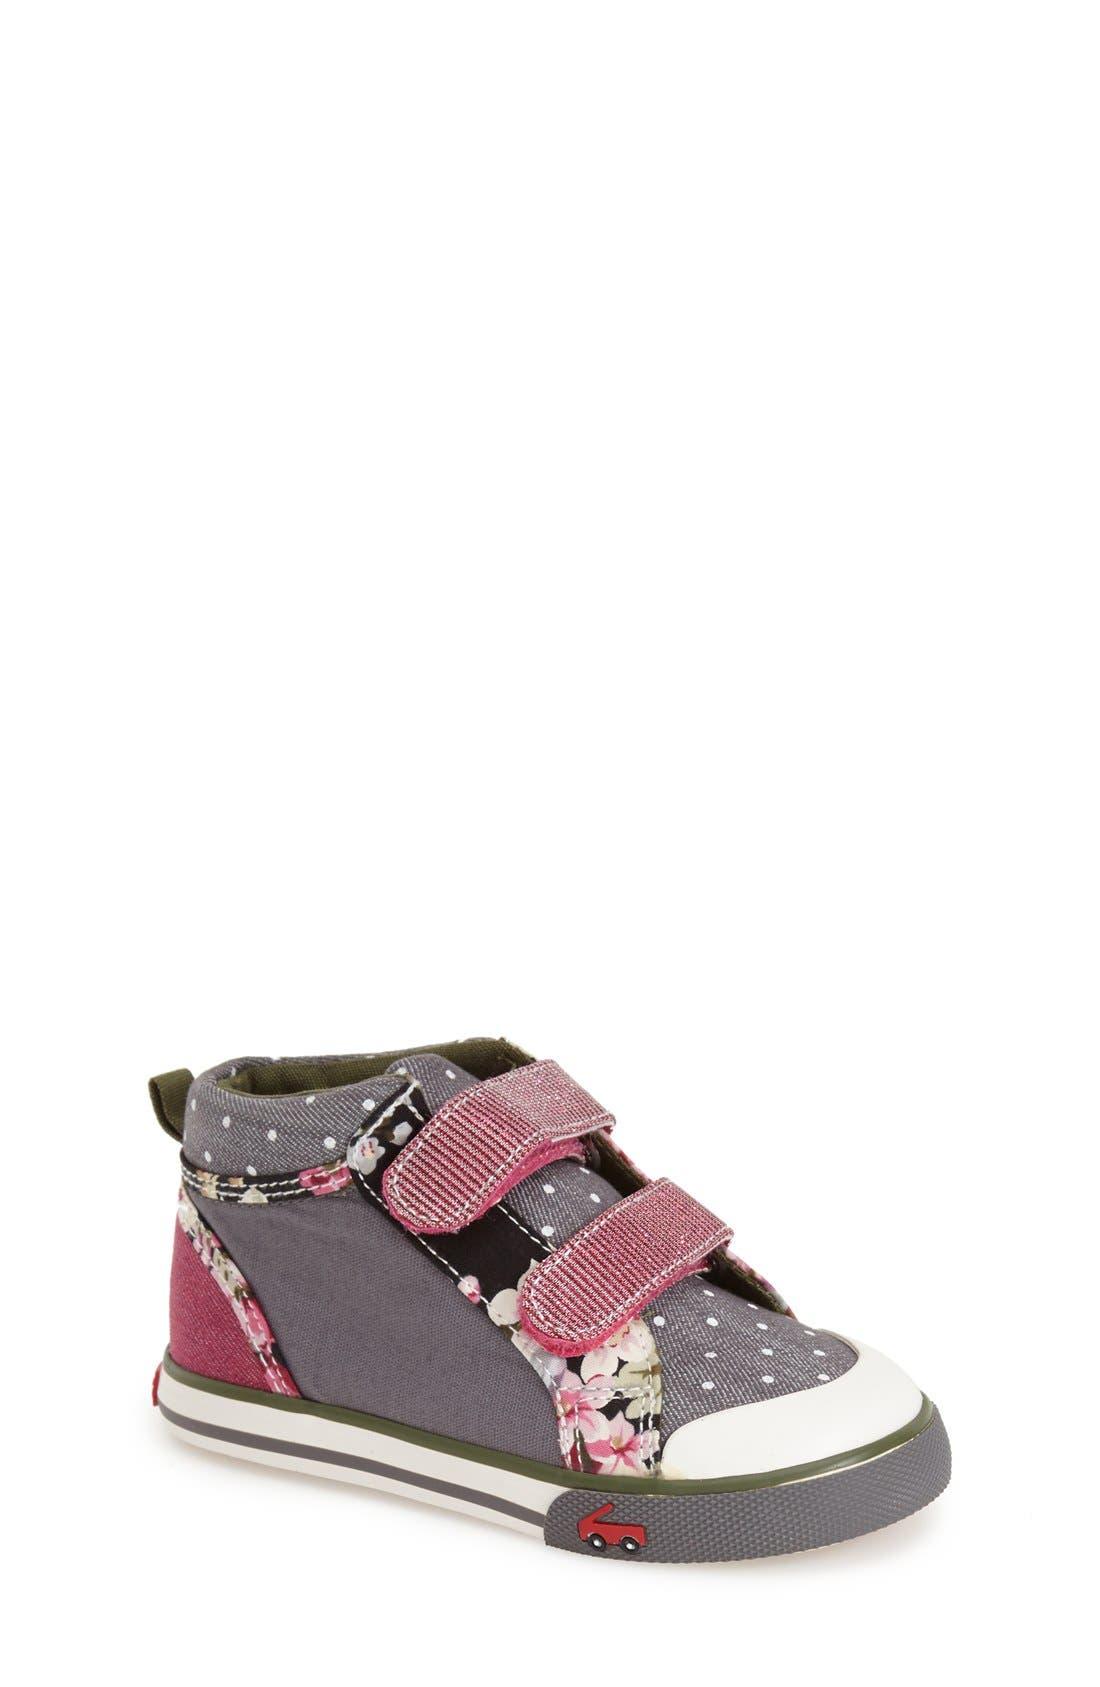 'Kya' High TopSneaker, Main, color, 020